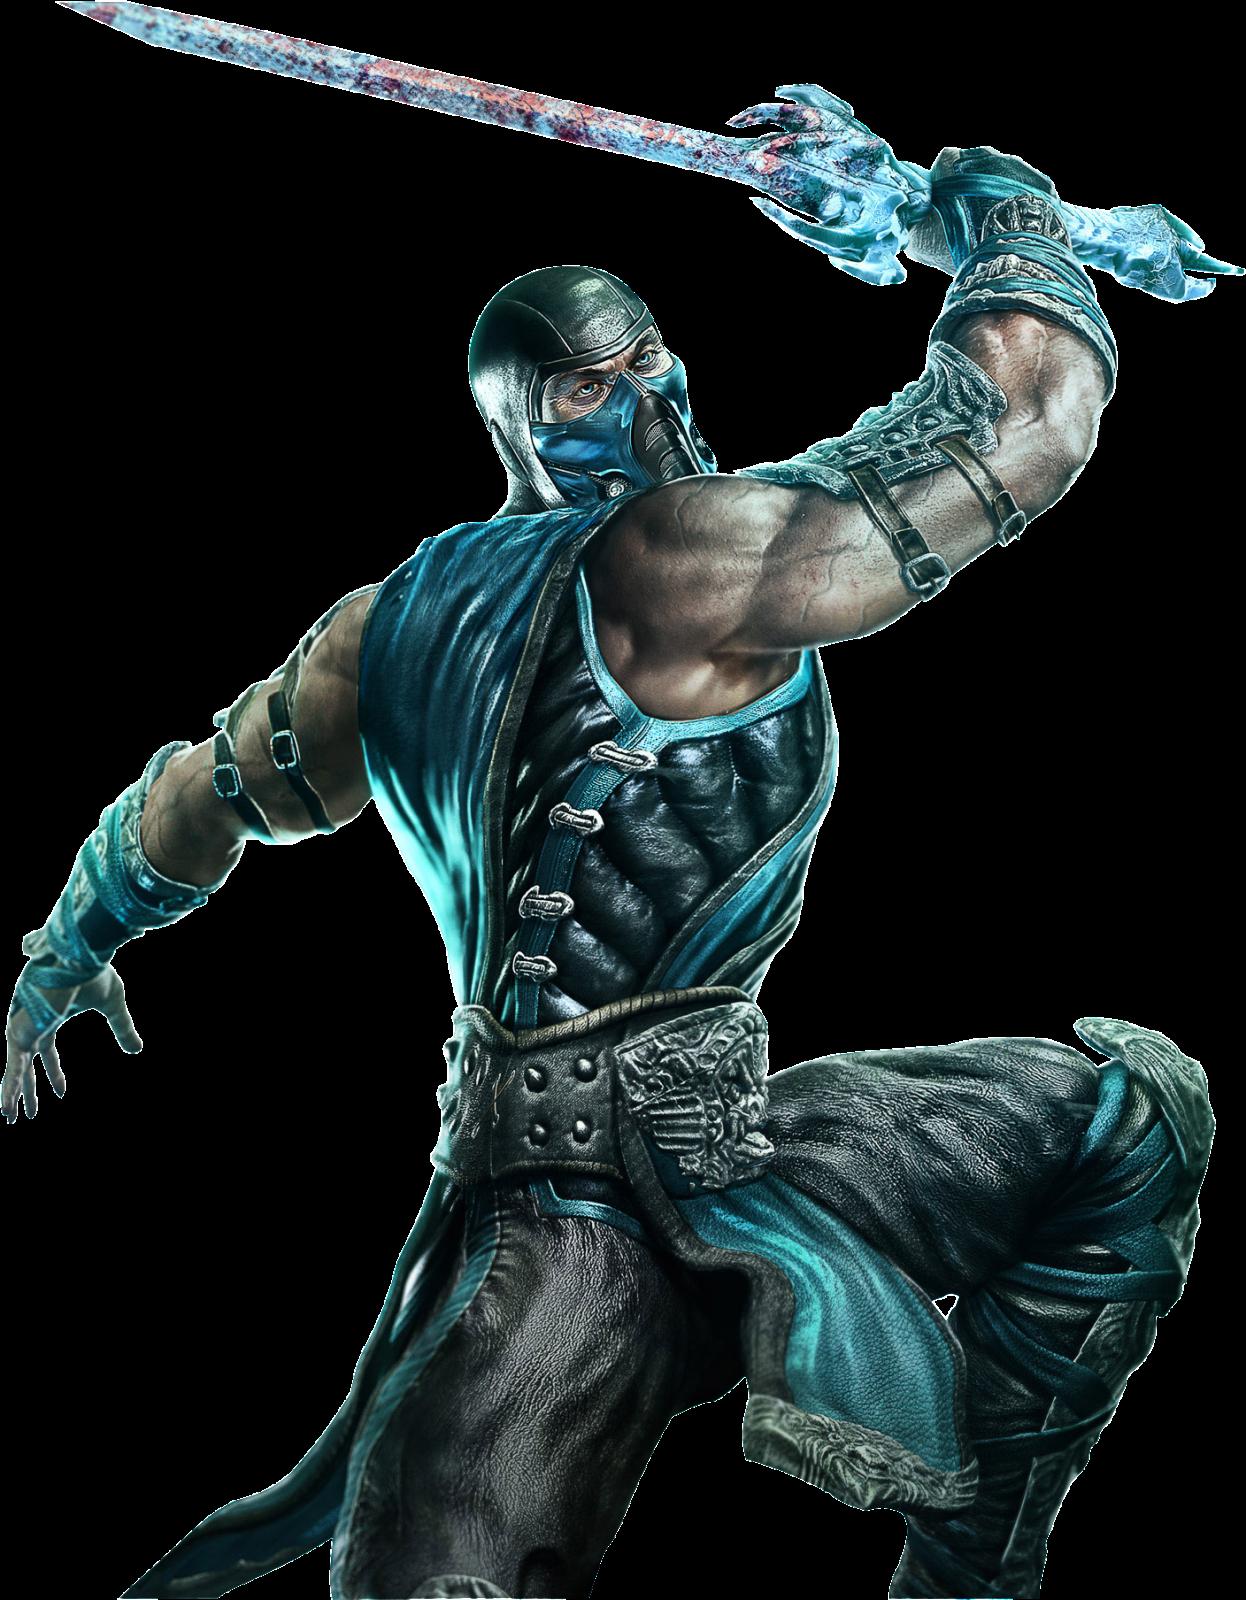 Mortal Kombat HD PNG - 117366